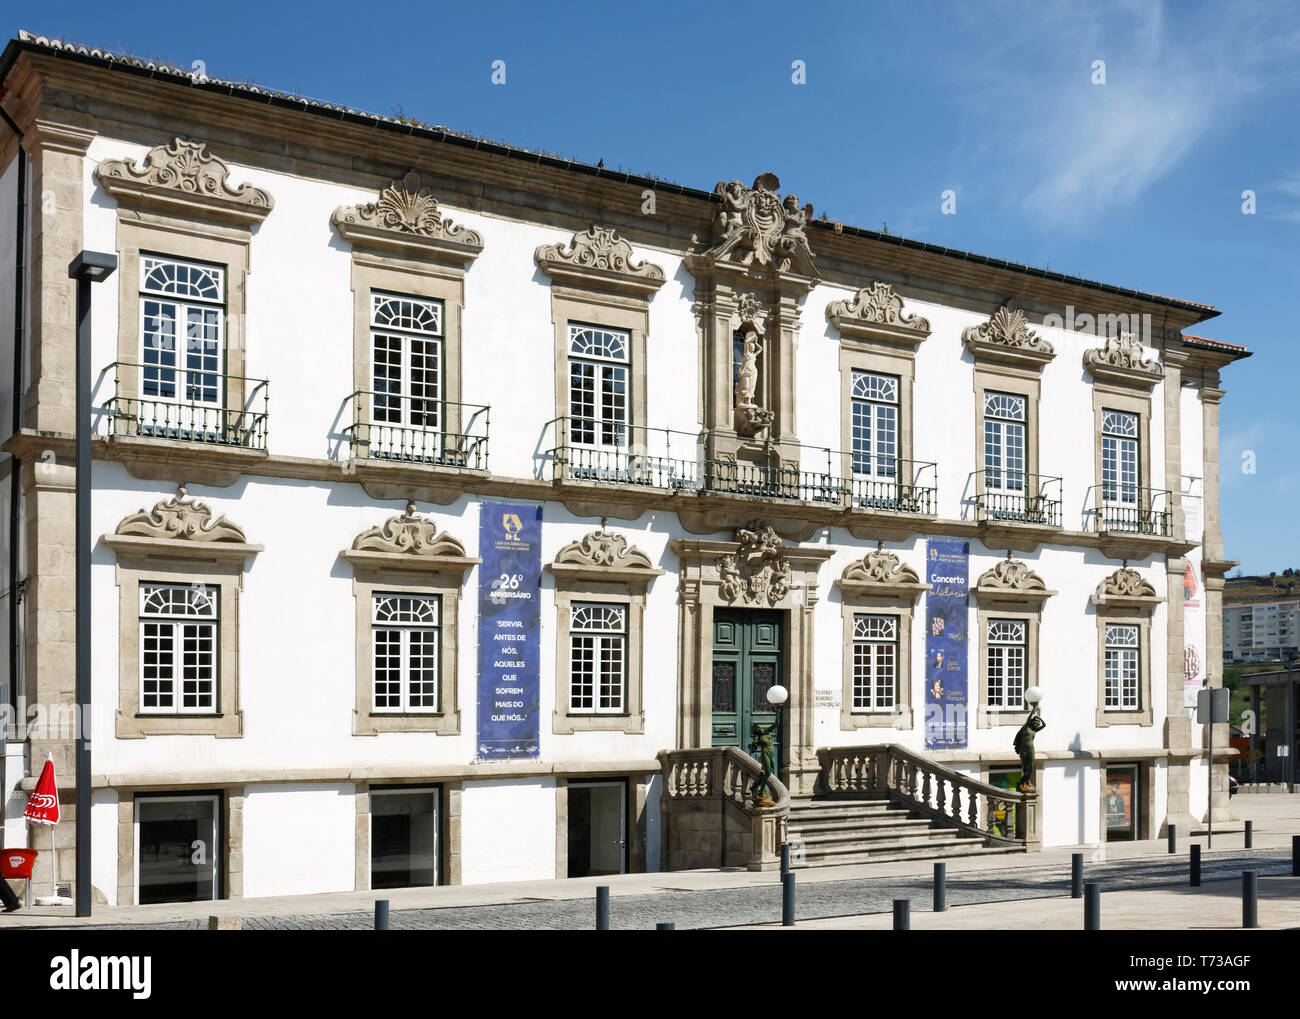 Ribeiro Conceicao Theater, 18. Jahrhundert stammende Fassade, umgebaut 1929, Barock, reich verzierte, Europa, Lamego, Portugal, Feder, horizontal Stockbild